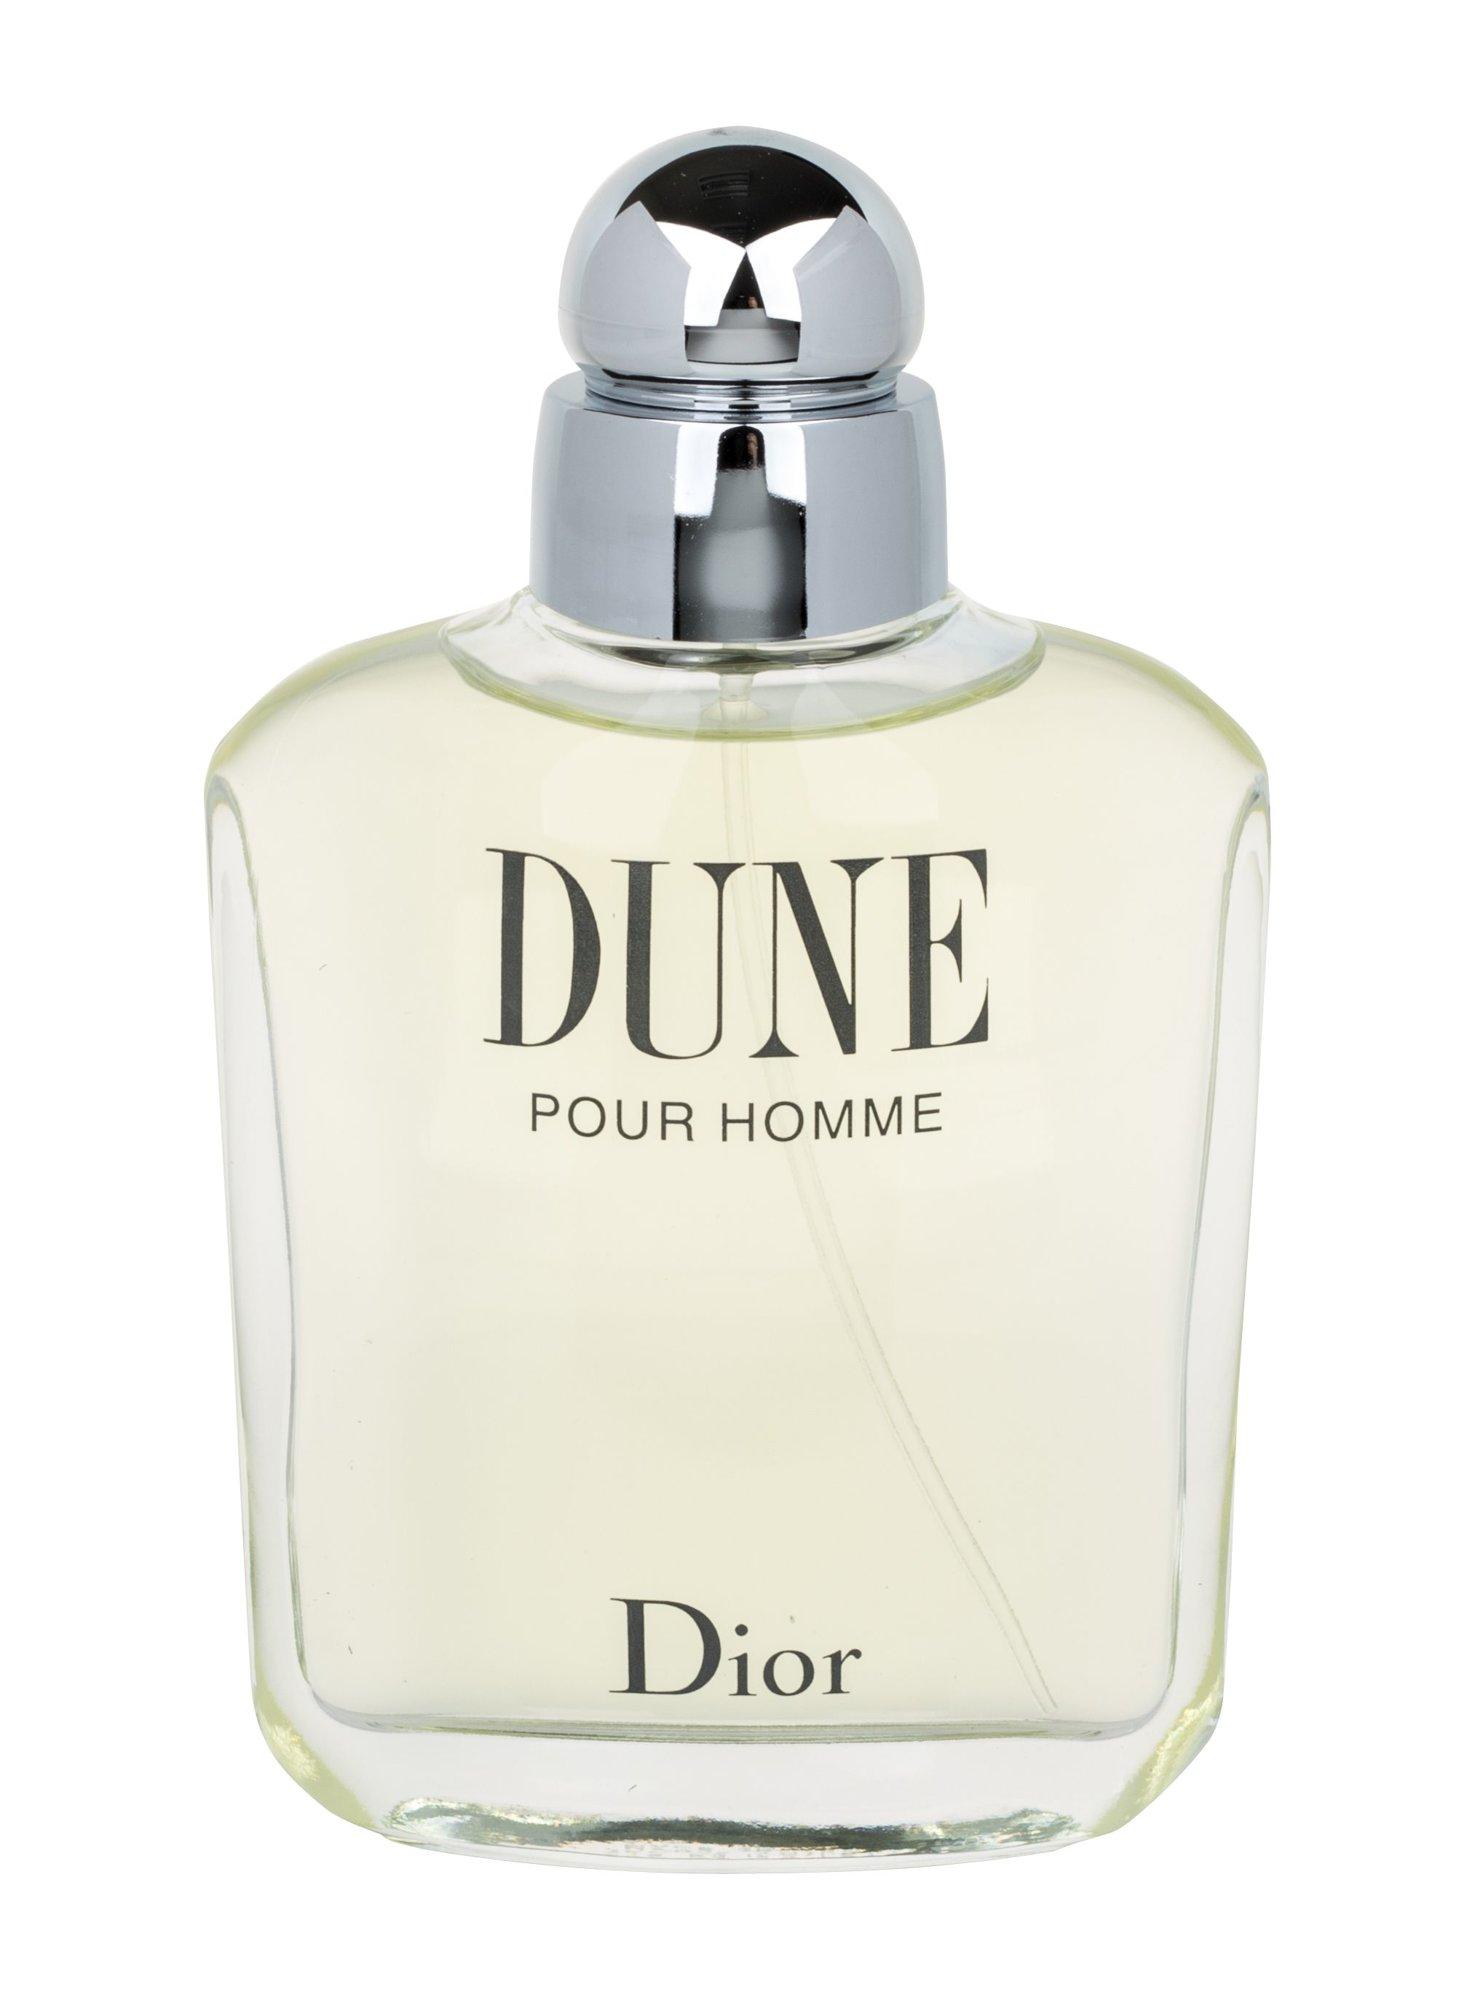 Christian Dior Dune Pour Homme EDT 100ml